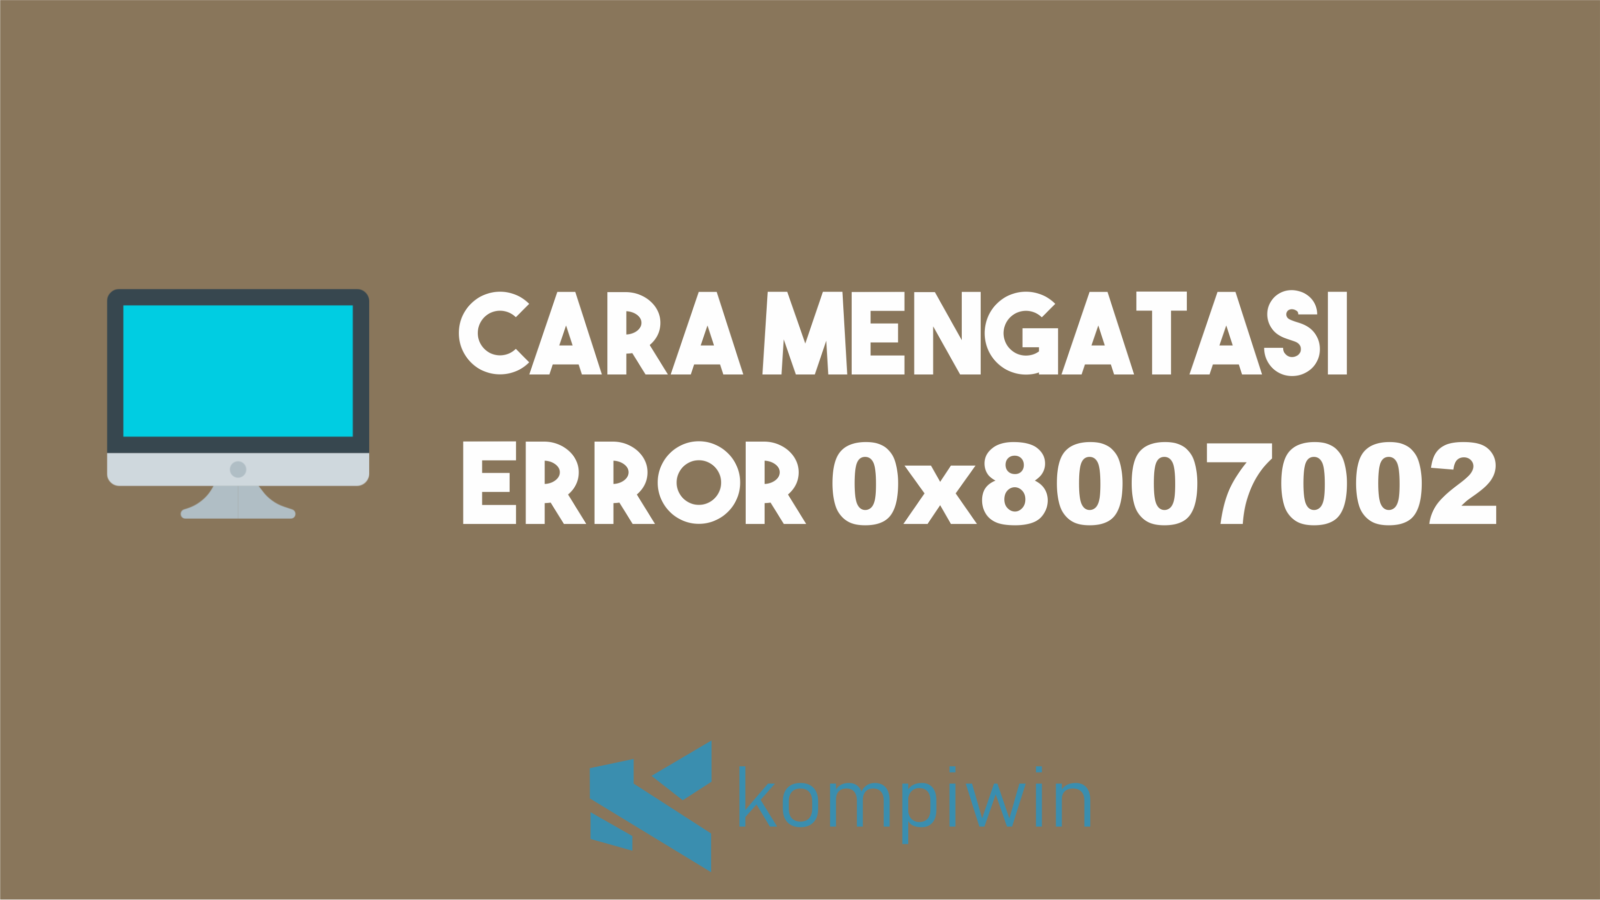 Cara Mengatasi Error 0x8007002 1